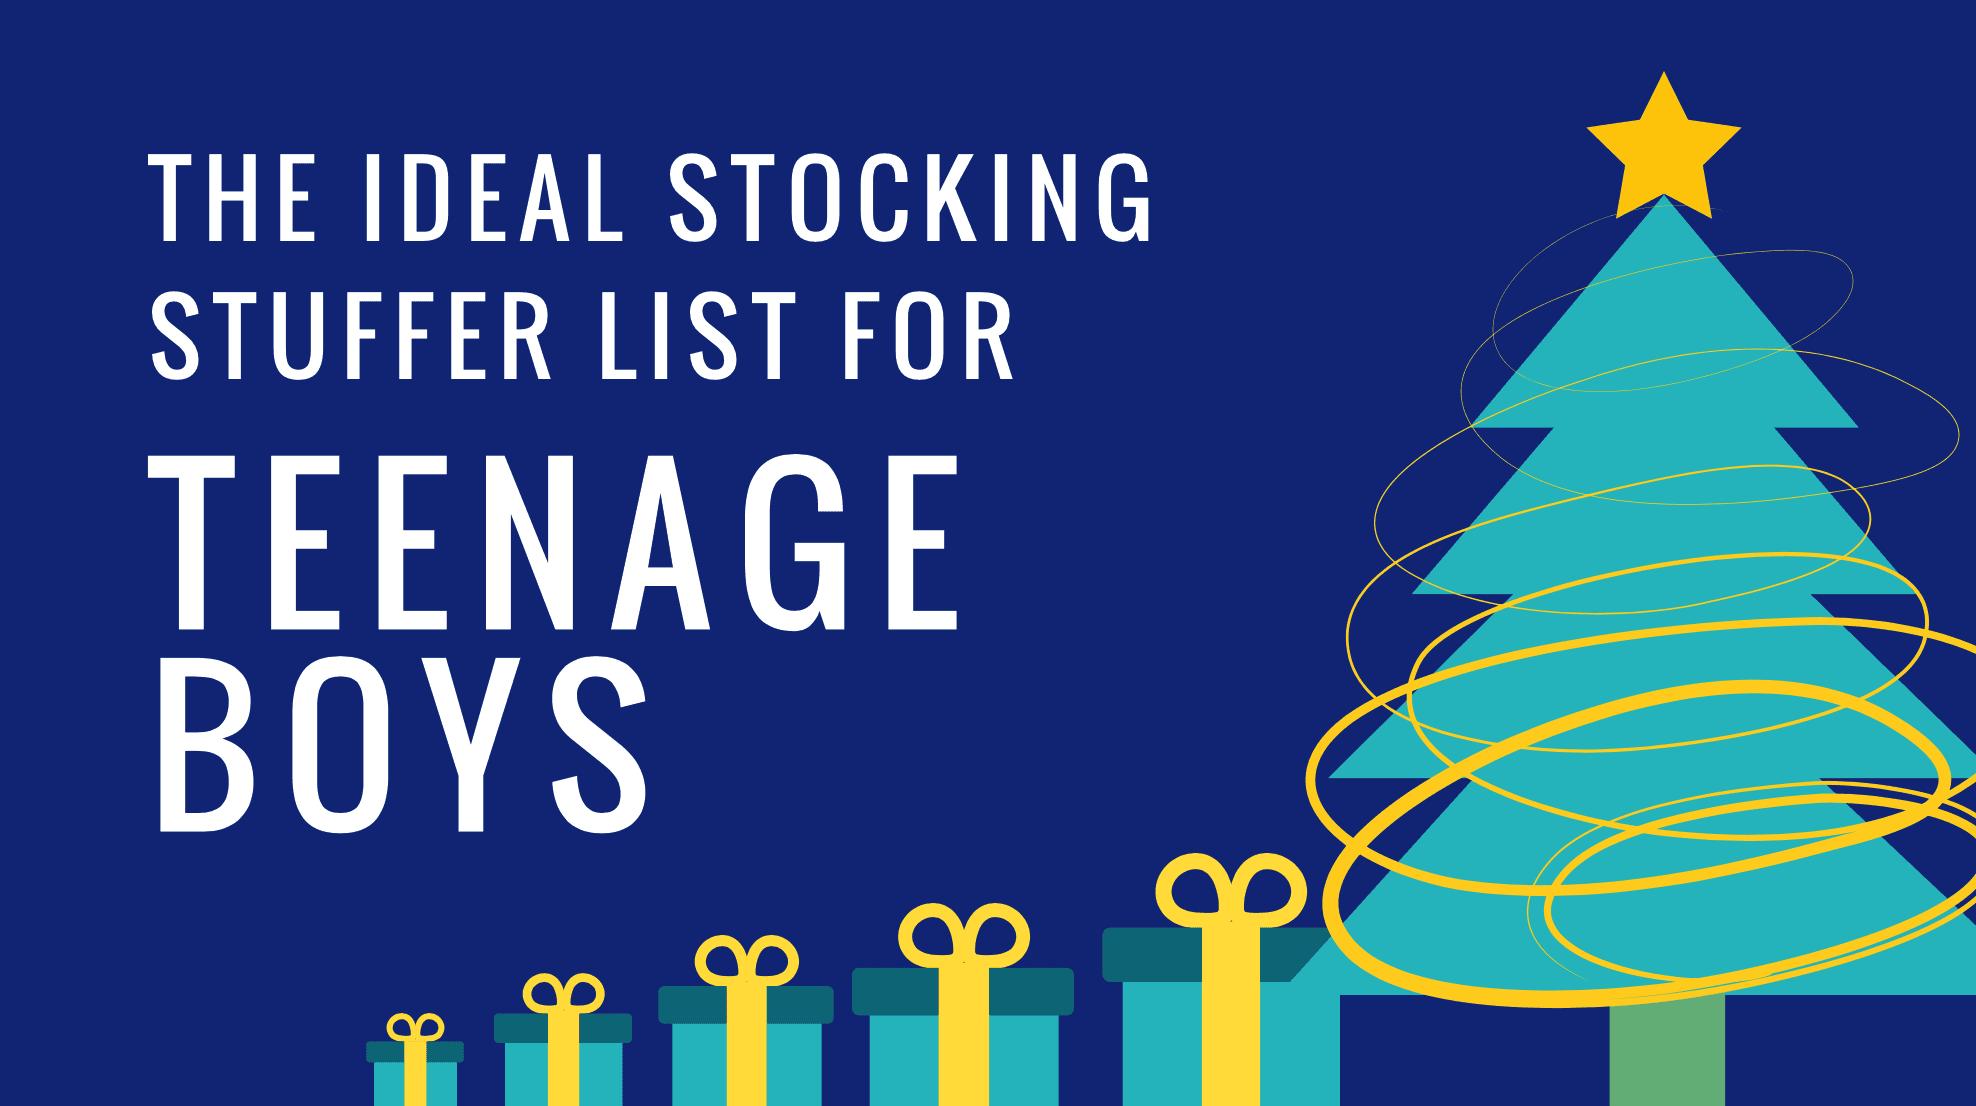 Stocking stuffer ideas for teenage boys stuffers for Stocking stuffer ideas 2016